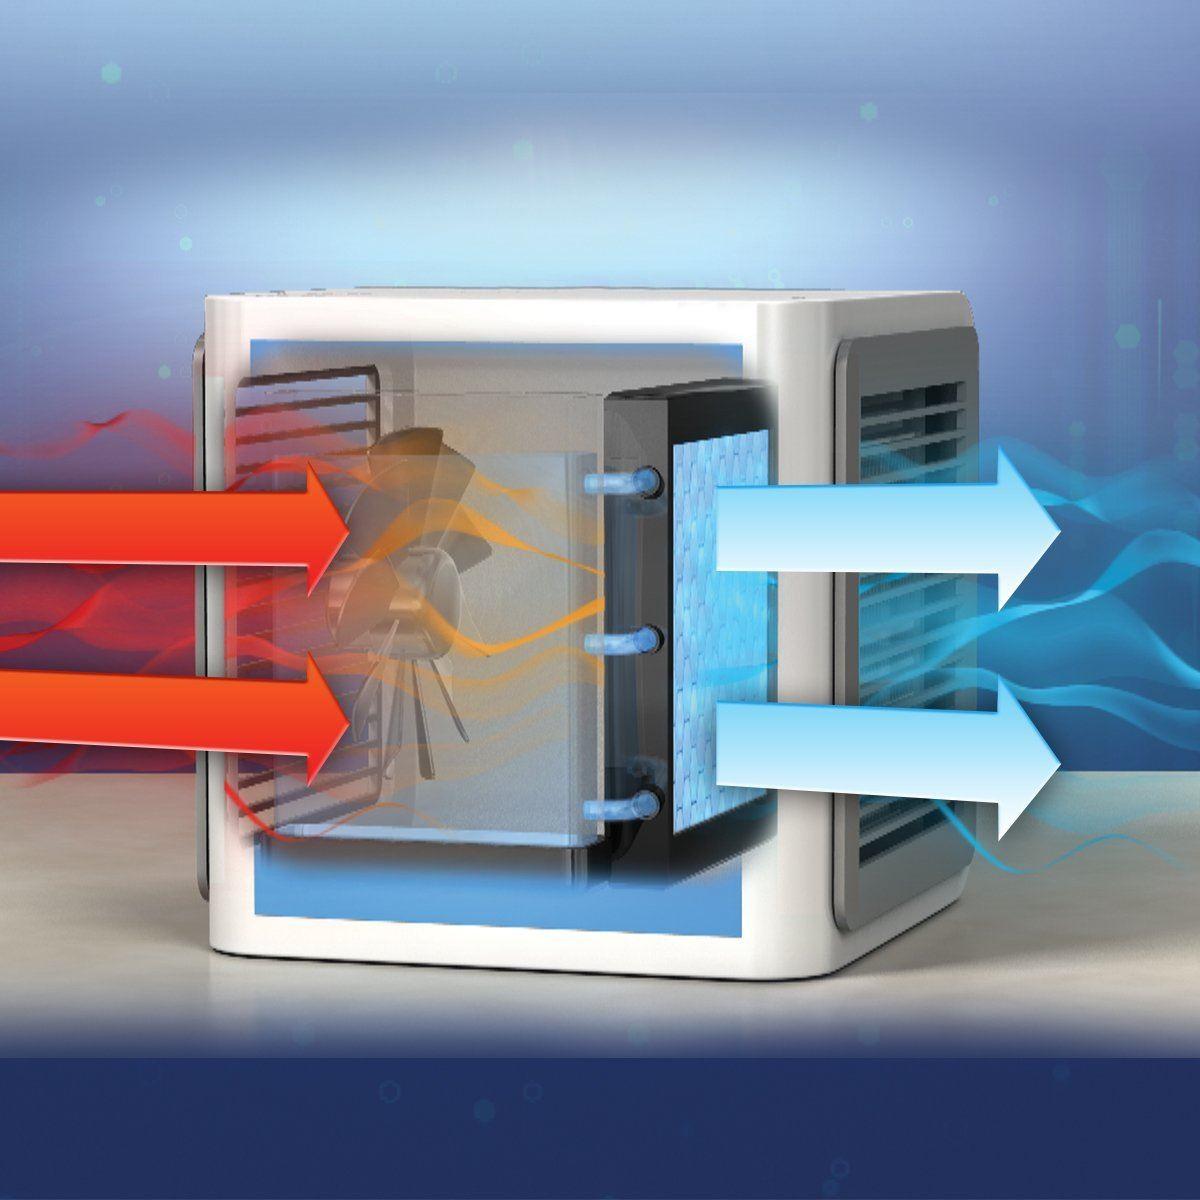 jml arctic air fan portable conditioner purifier. Black Bedroom Furniture Sets. Home Design Ideas